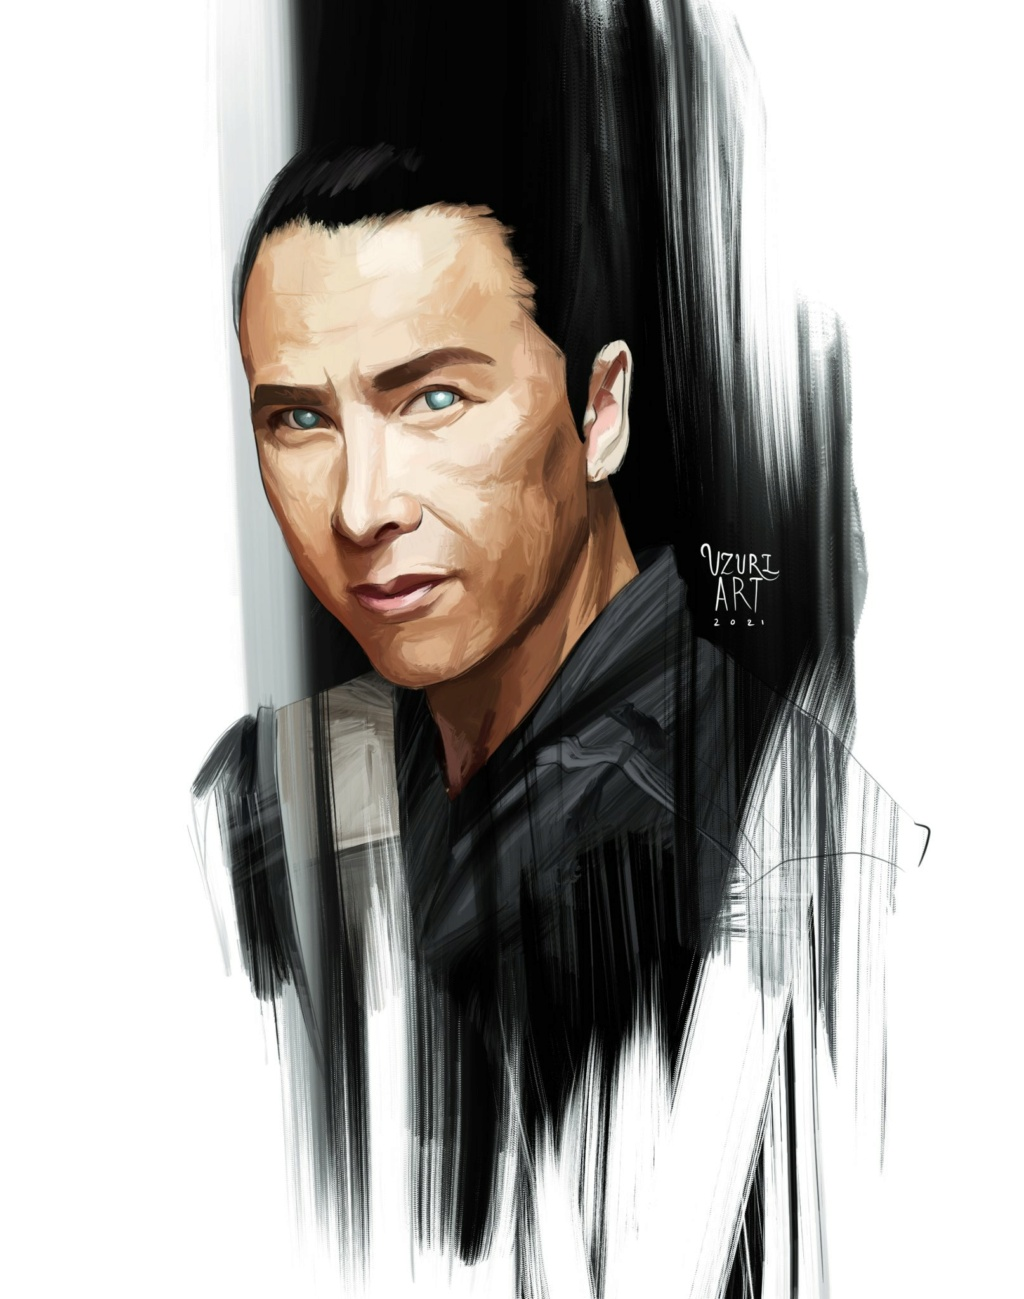 Digital Art par UZURI ART - Star Wars Uzuri_47